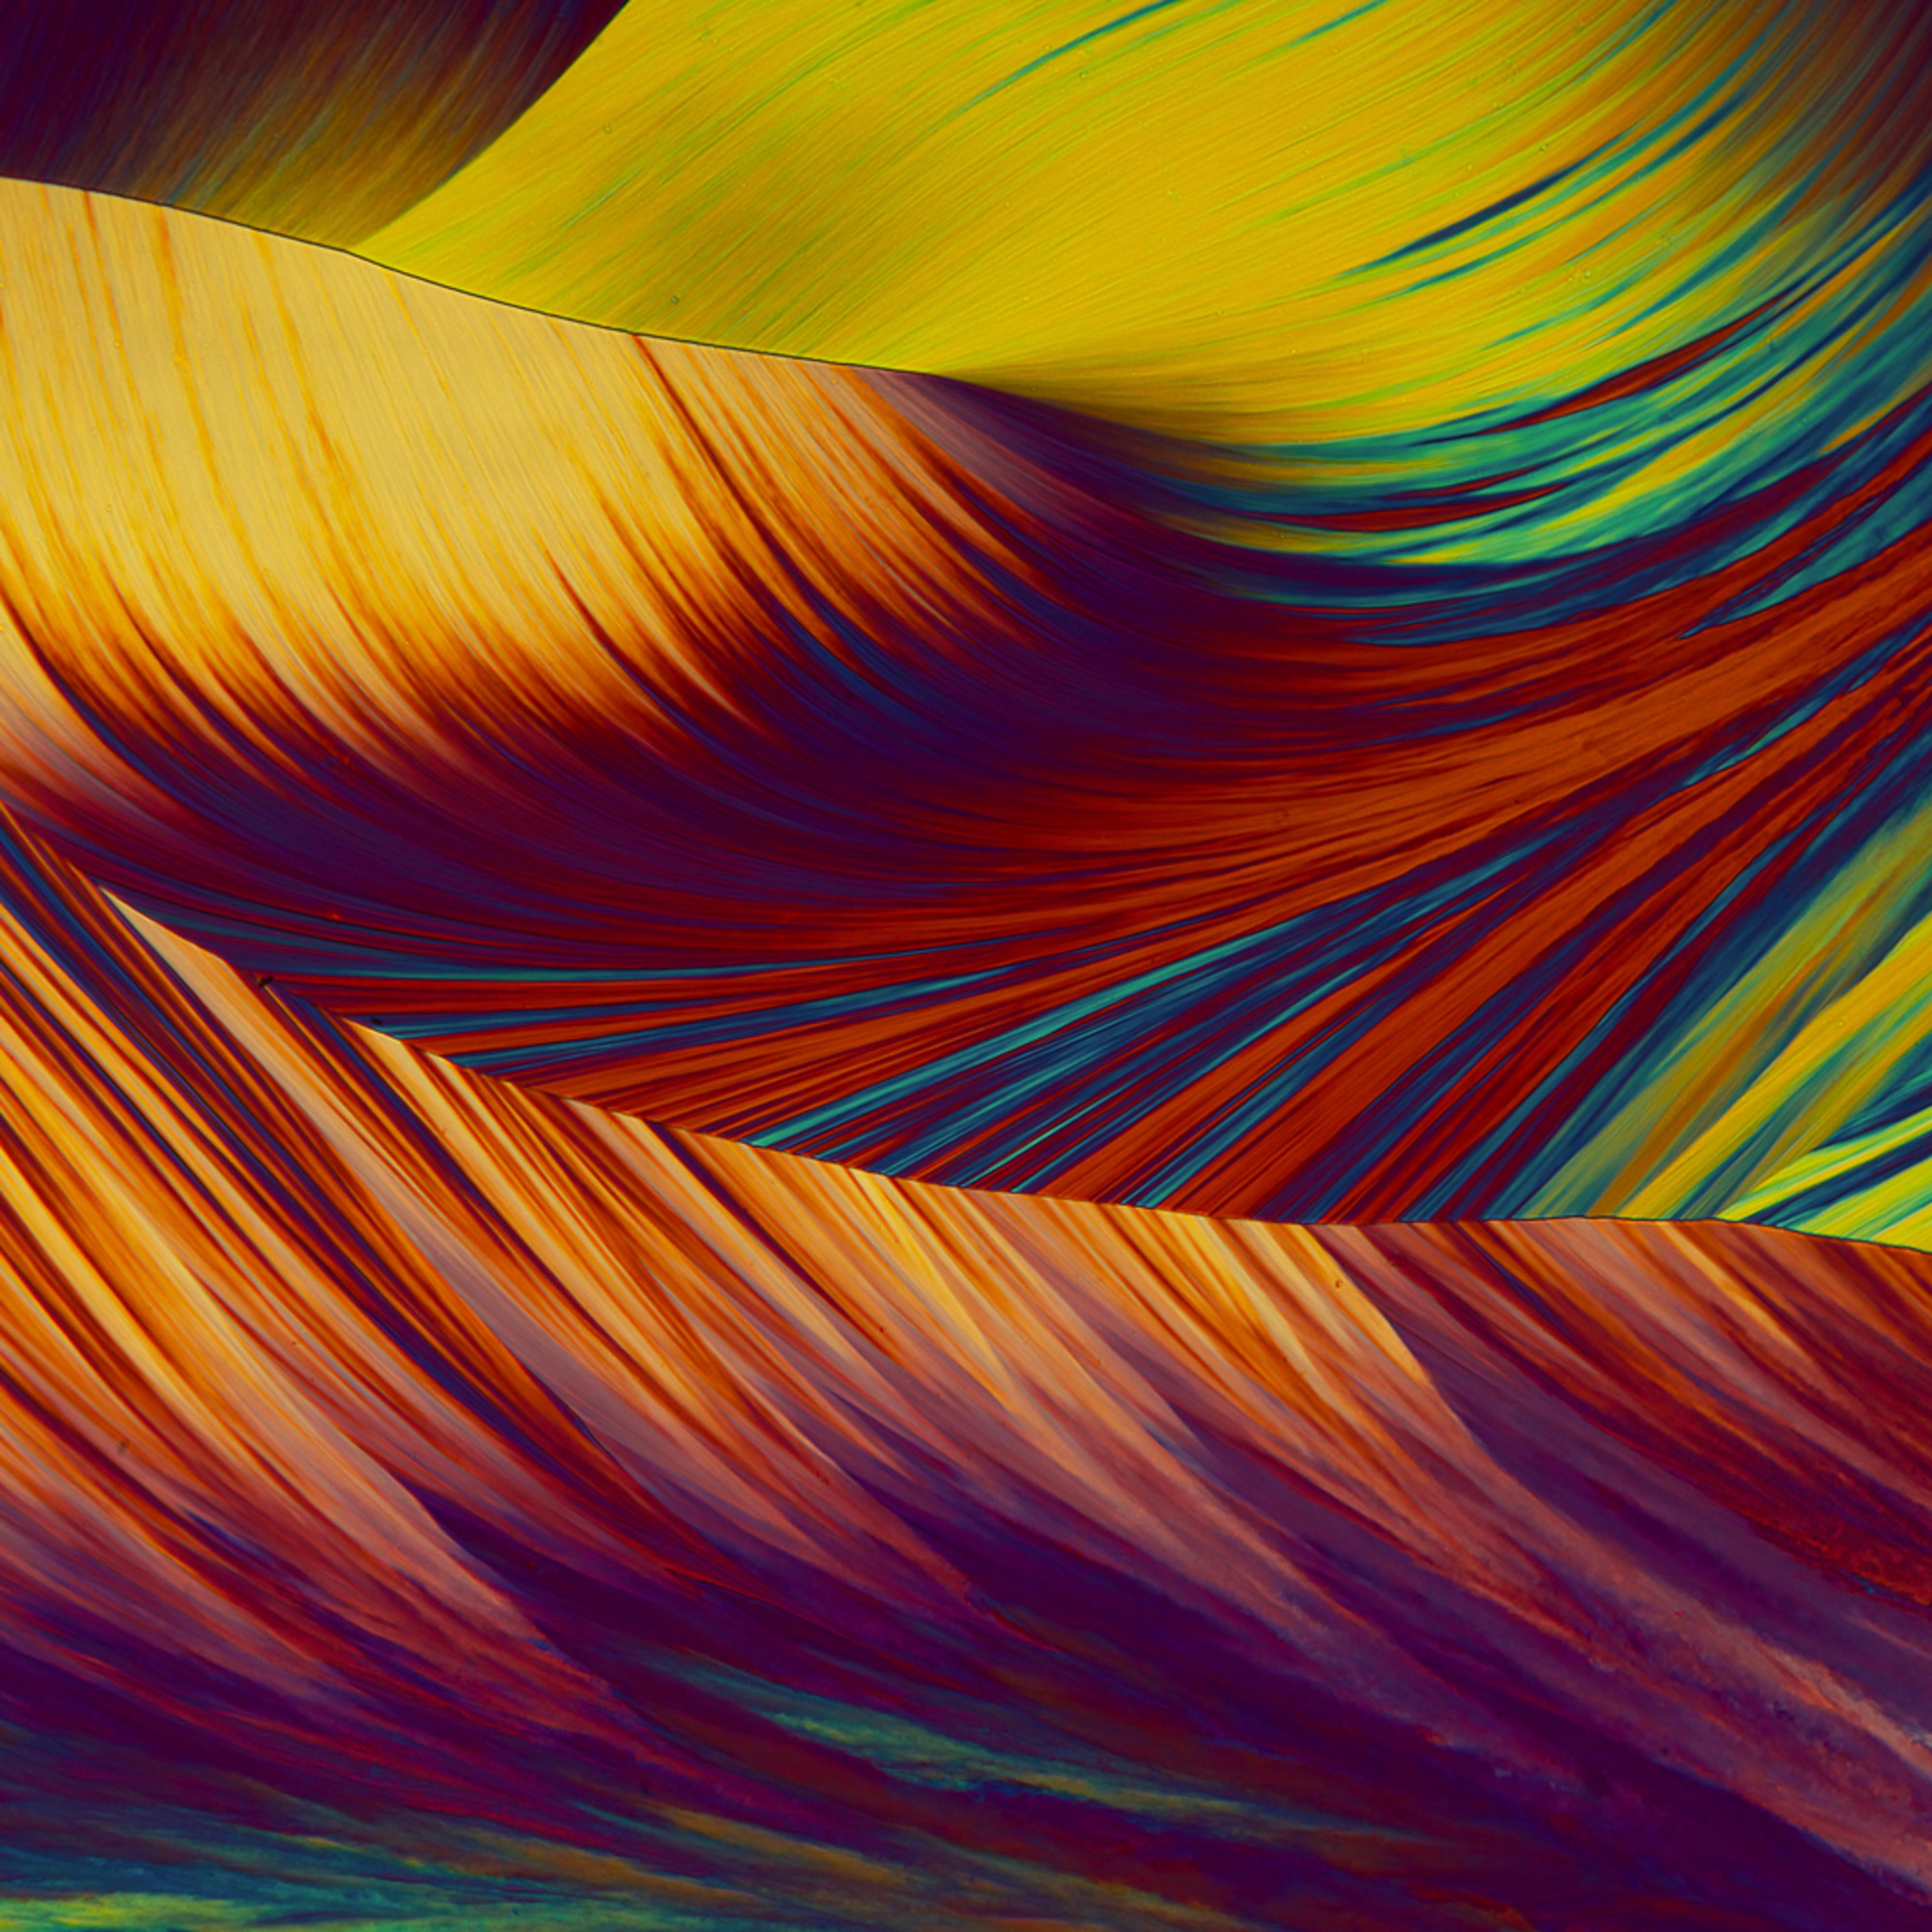 Undulating swirls ztvrg2